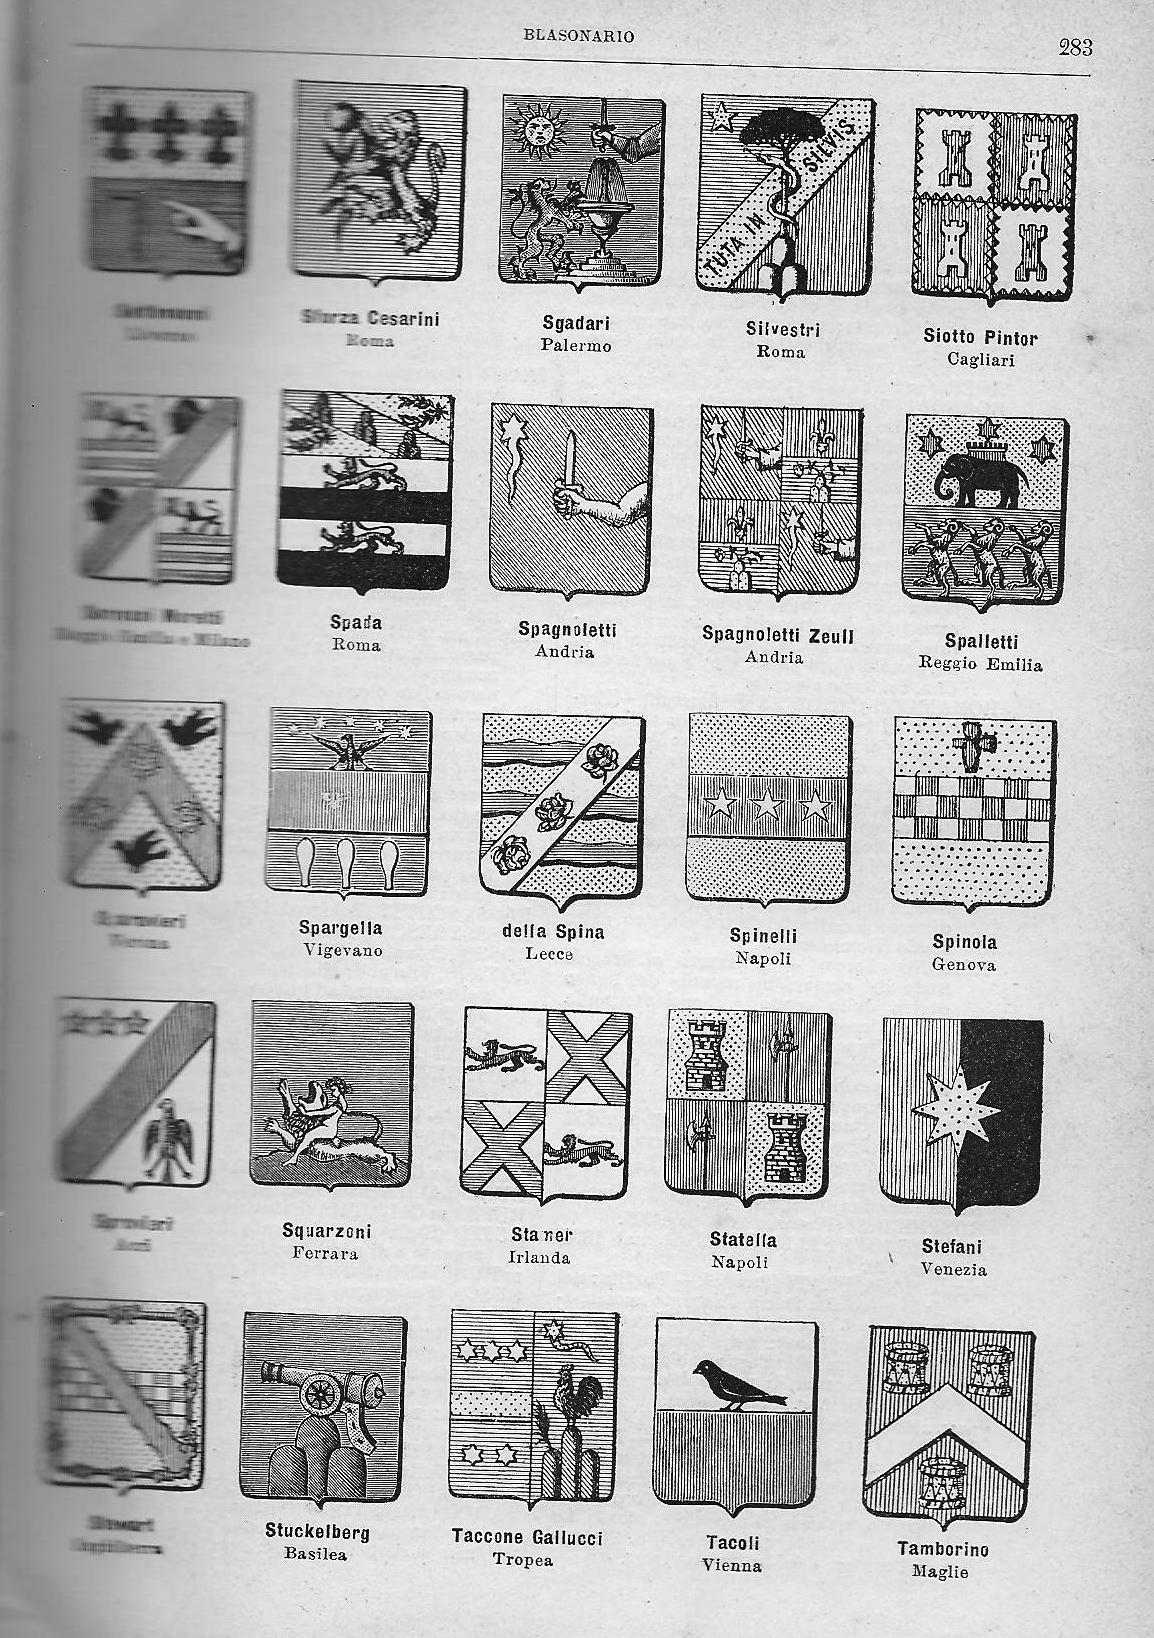 Calendario 1900.File Calendario D Oro 1900 Pagina 283 Jpg Wikimedia Commons